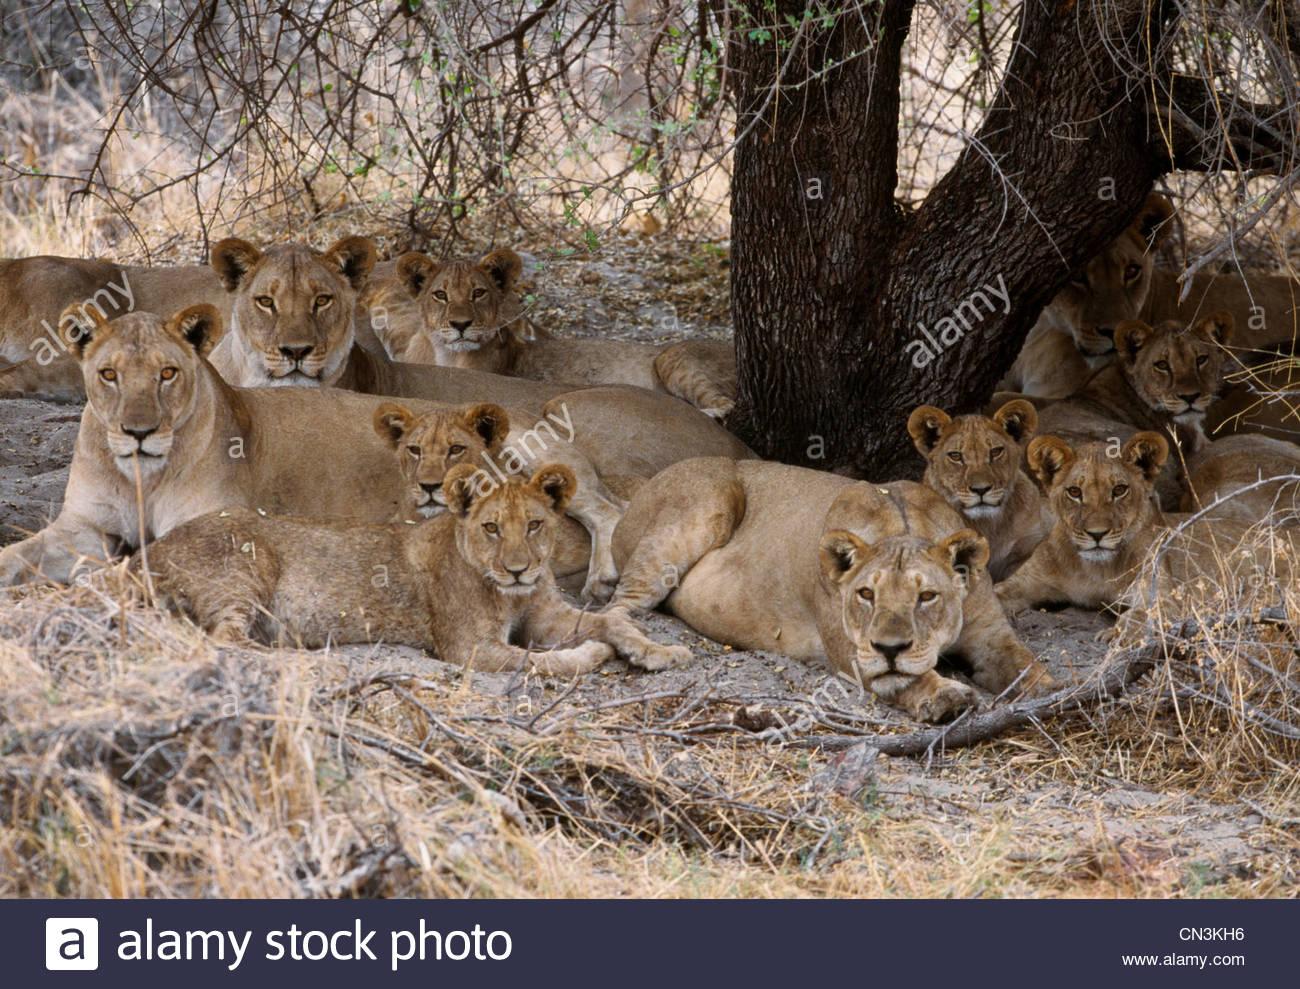 African lions, Okavango Delta, Botswana - Stock Image